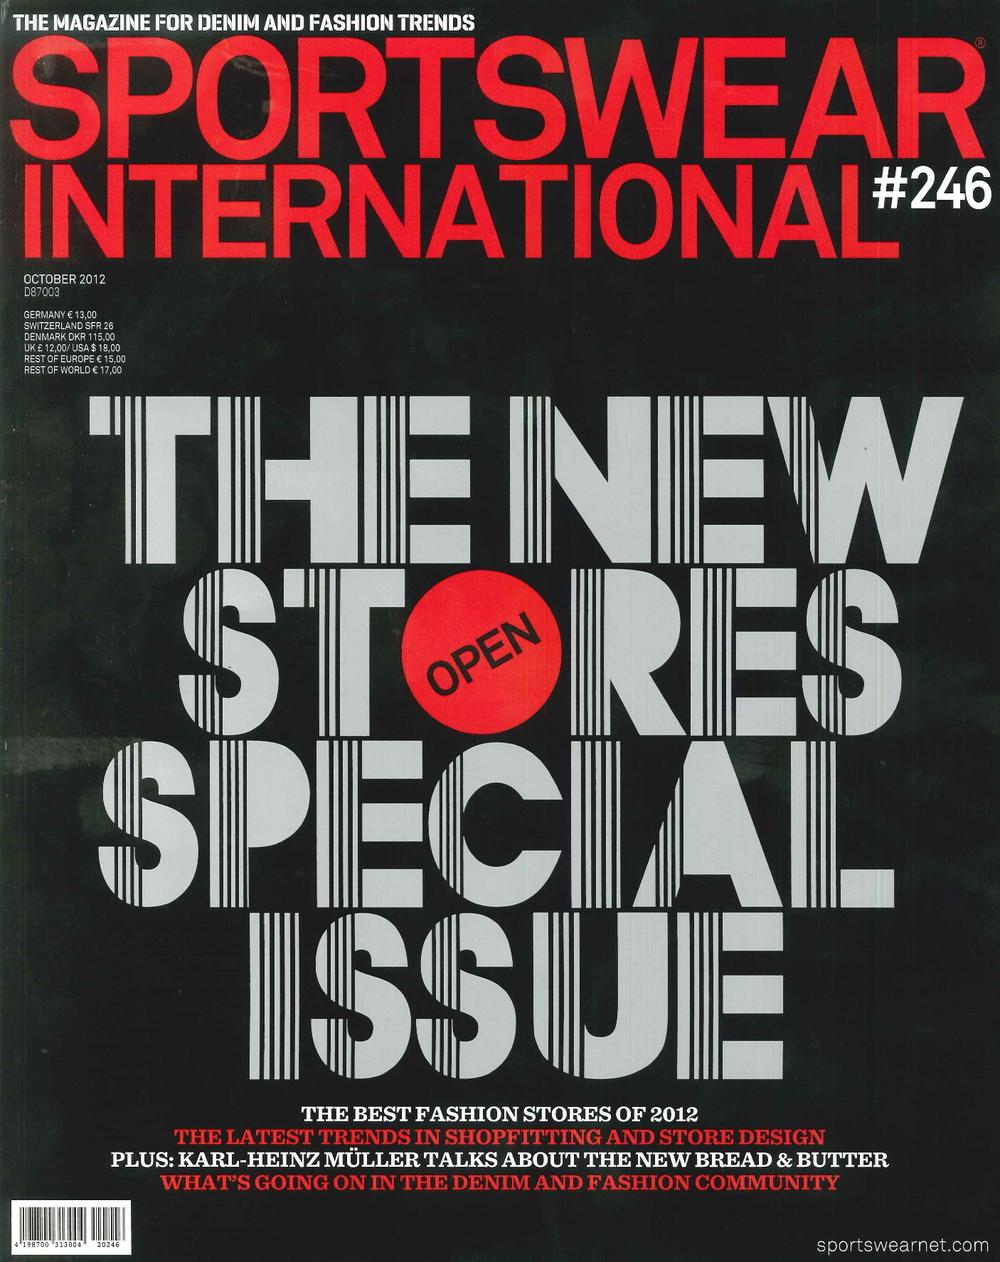 SPORTSWEAR INTERNATIONAL COVER.jpg